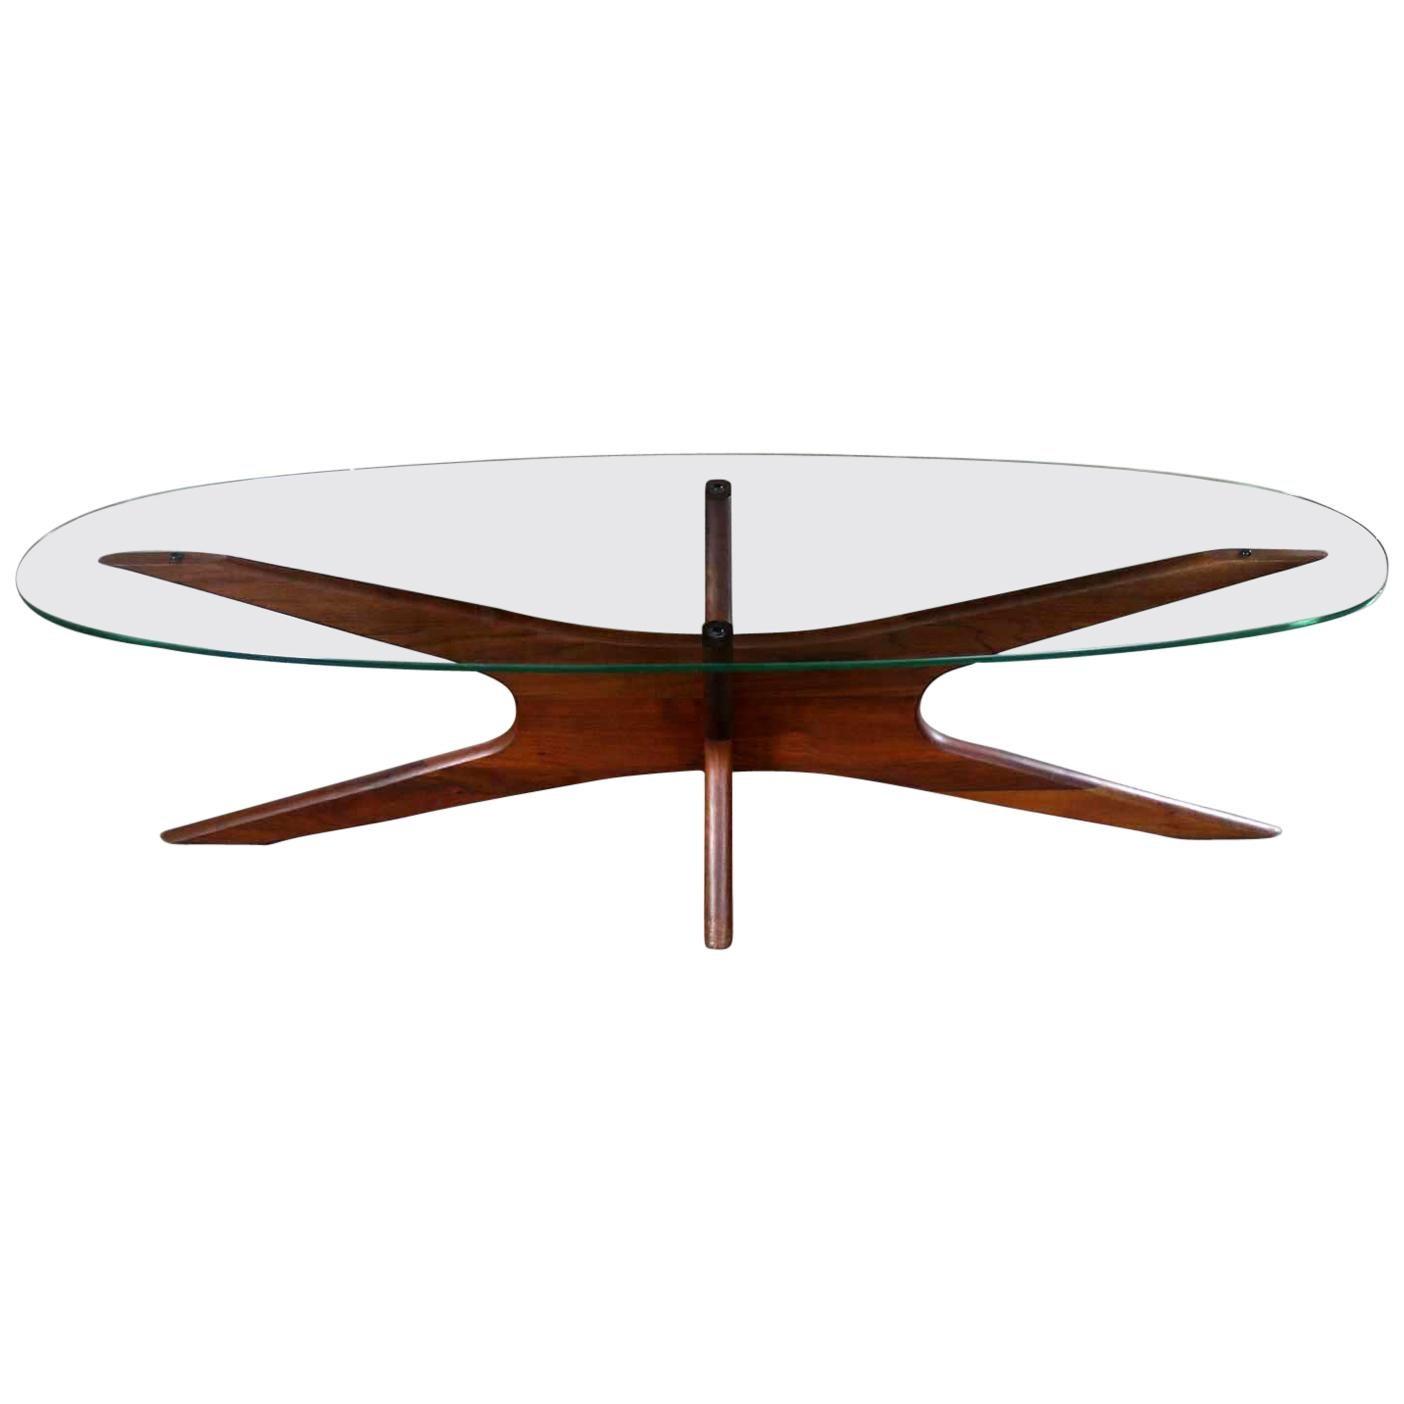 Adrian Pearsall Walnut And Glass Jacks 893 TGO Oval Coffee Table